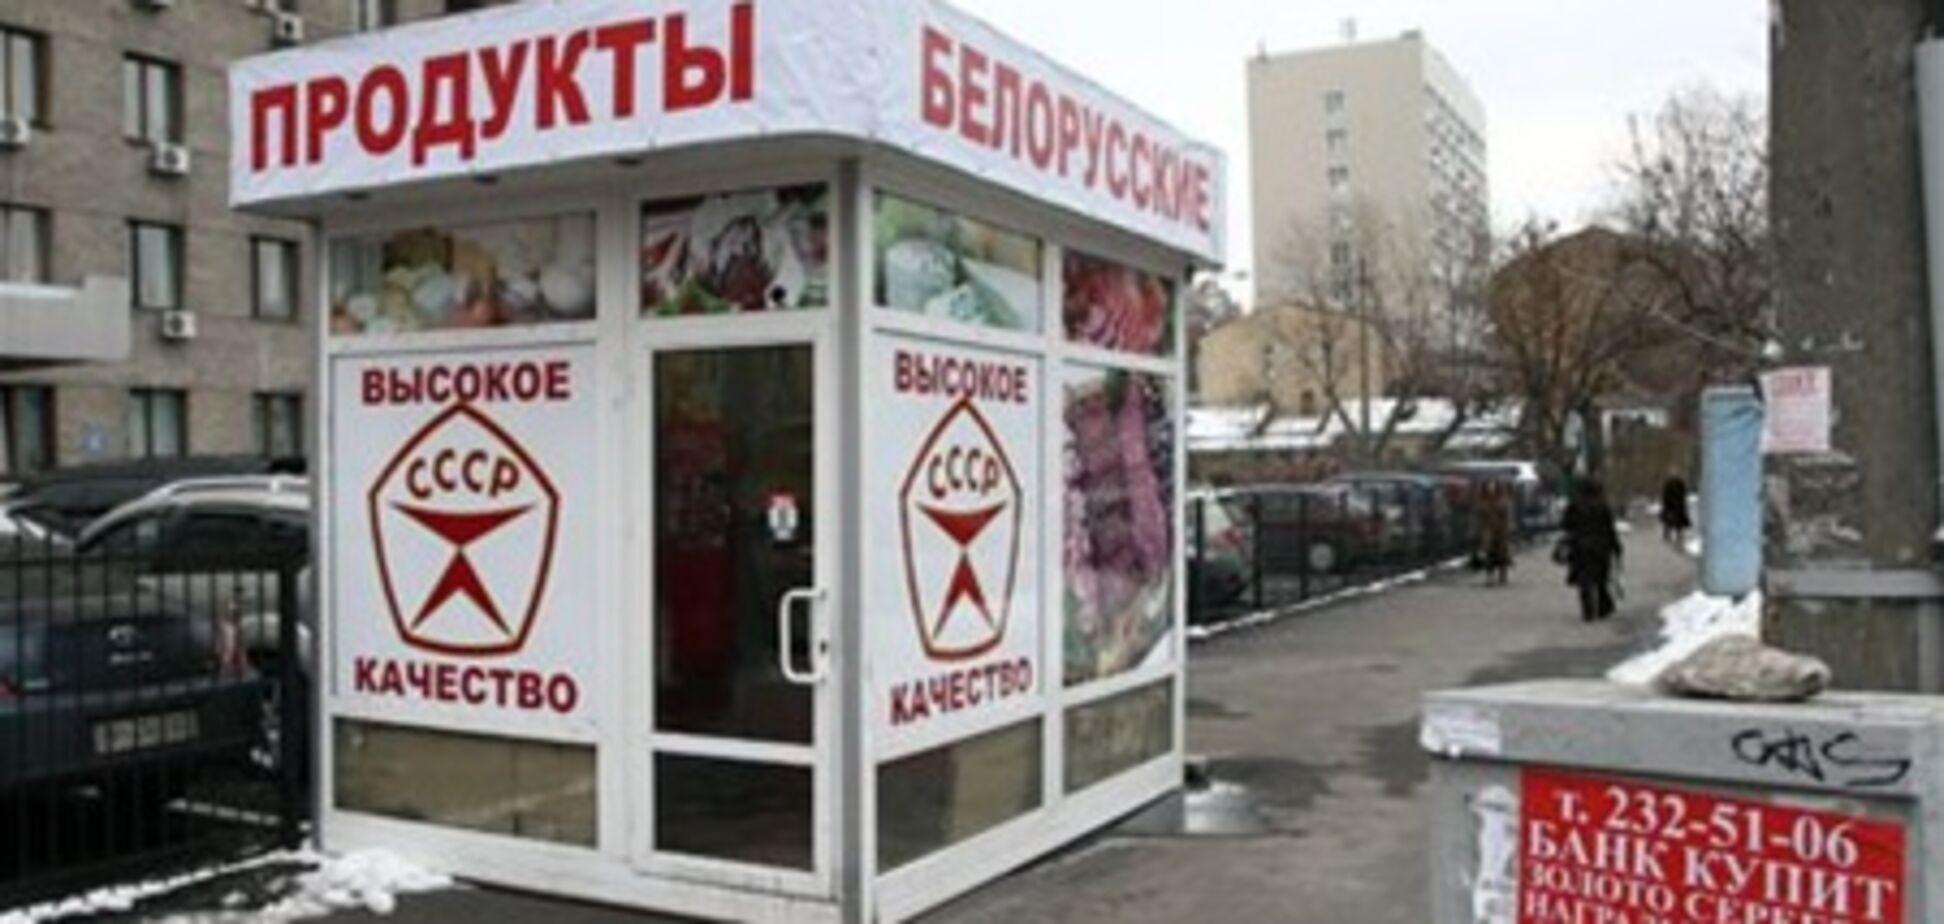 Белорусский мясо-молочный фронт